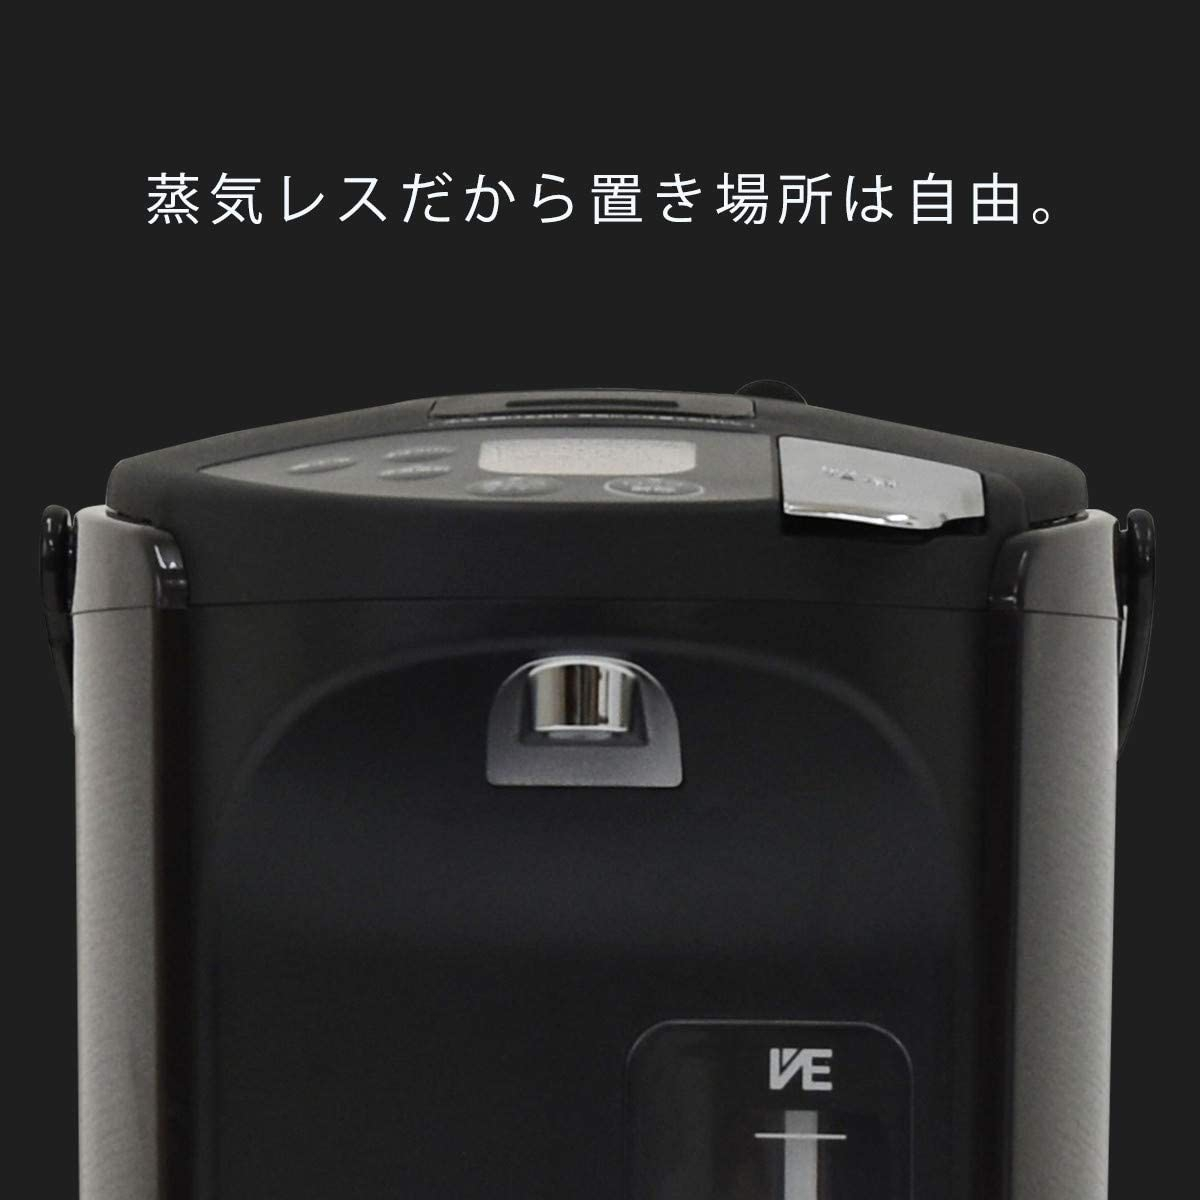 TIGER(タイガー)蒸気レスVE電気まほうびん PIS-A220の商品画像5